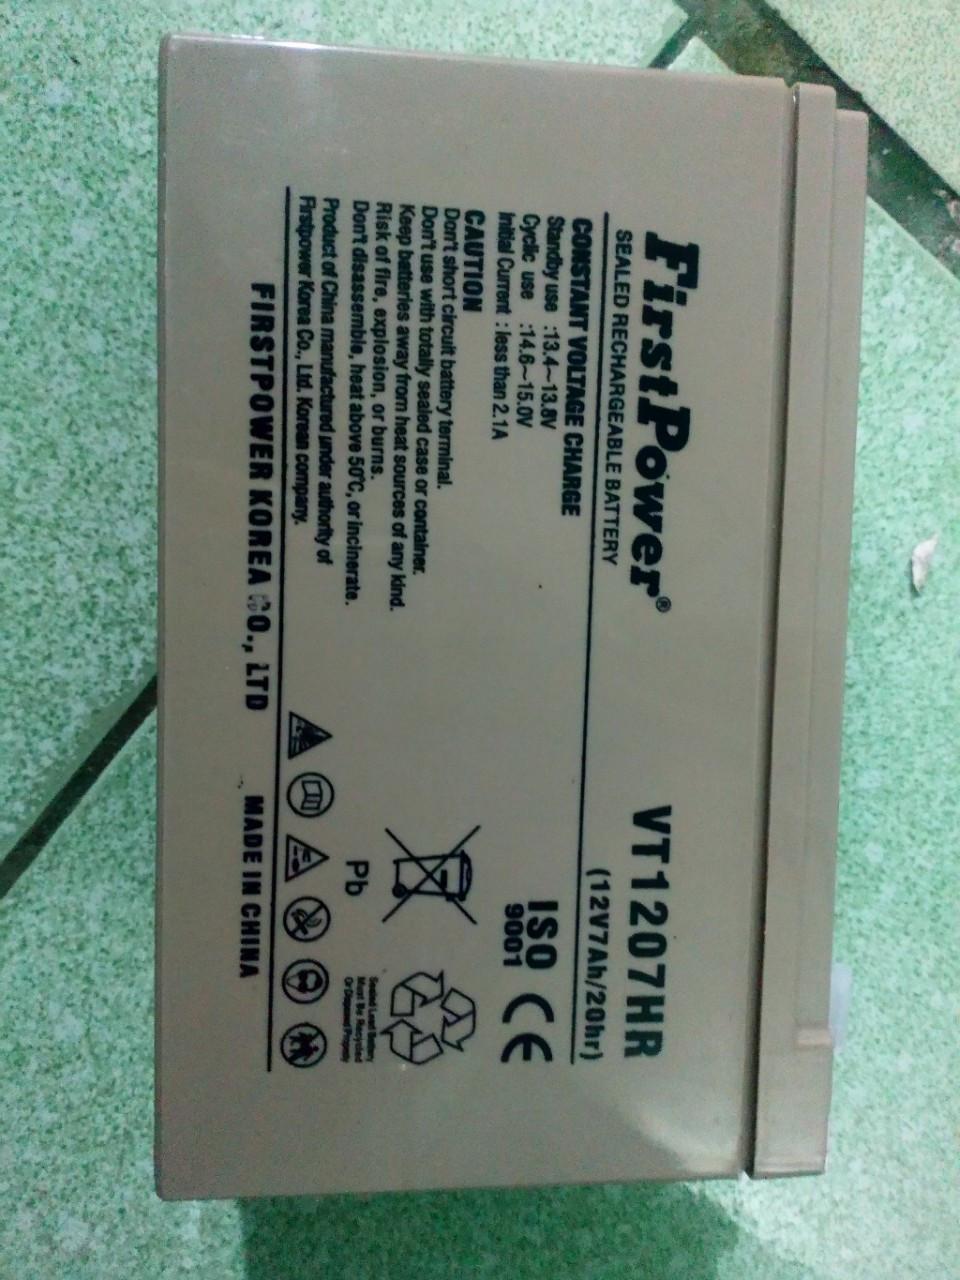 Bình ắc quy FirstPower - VT1207HR (FP1270HR)